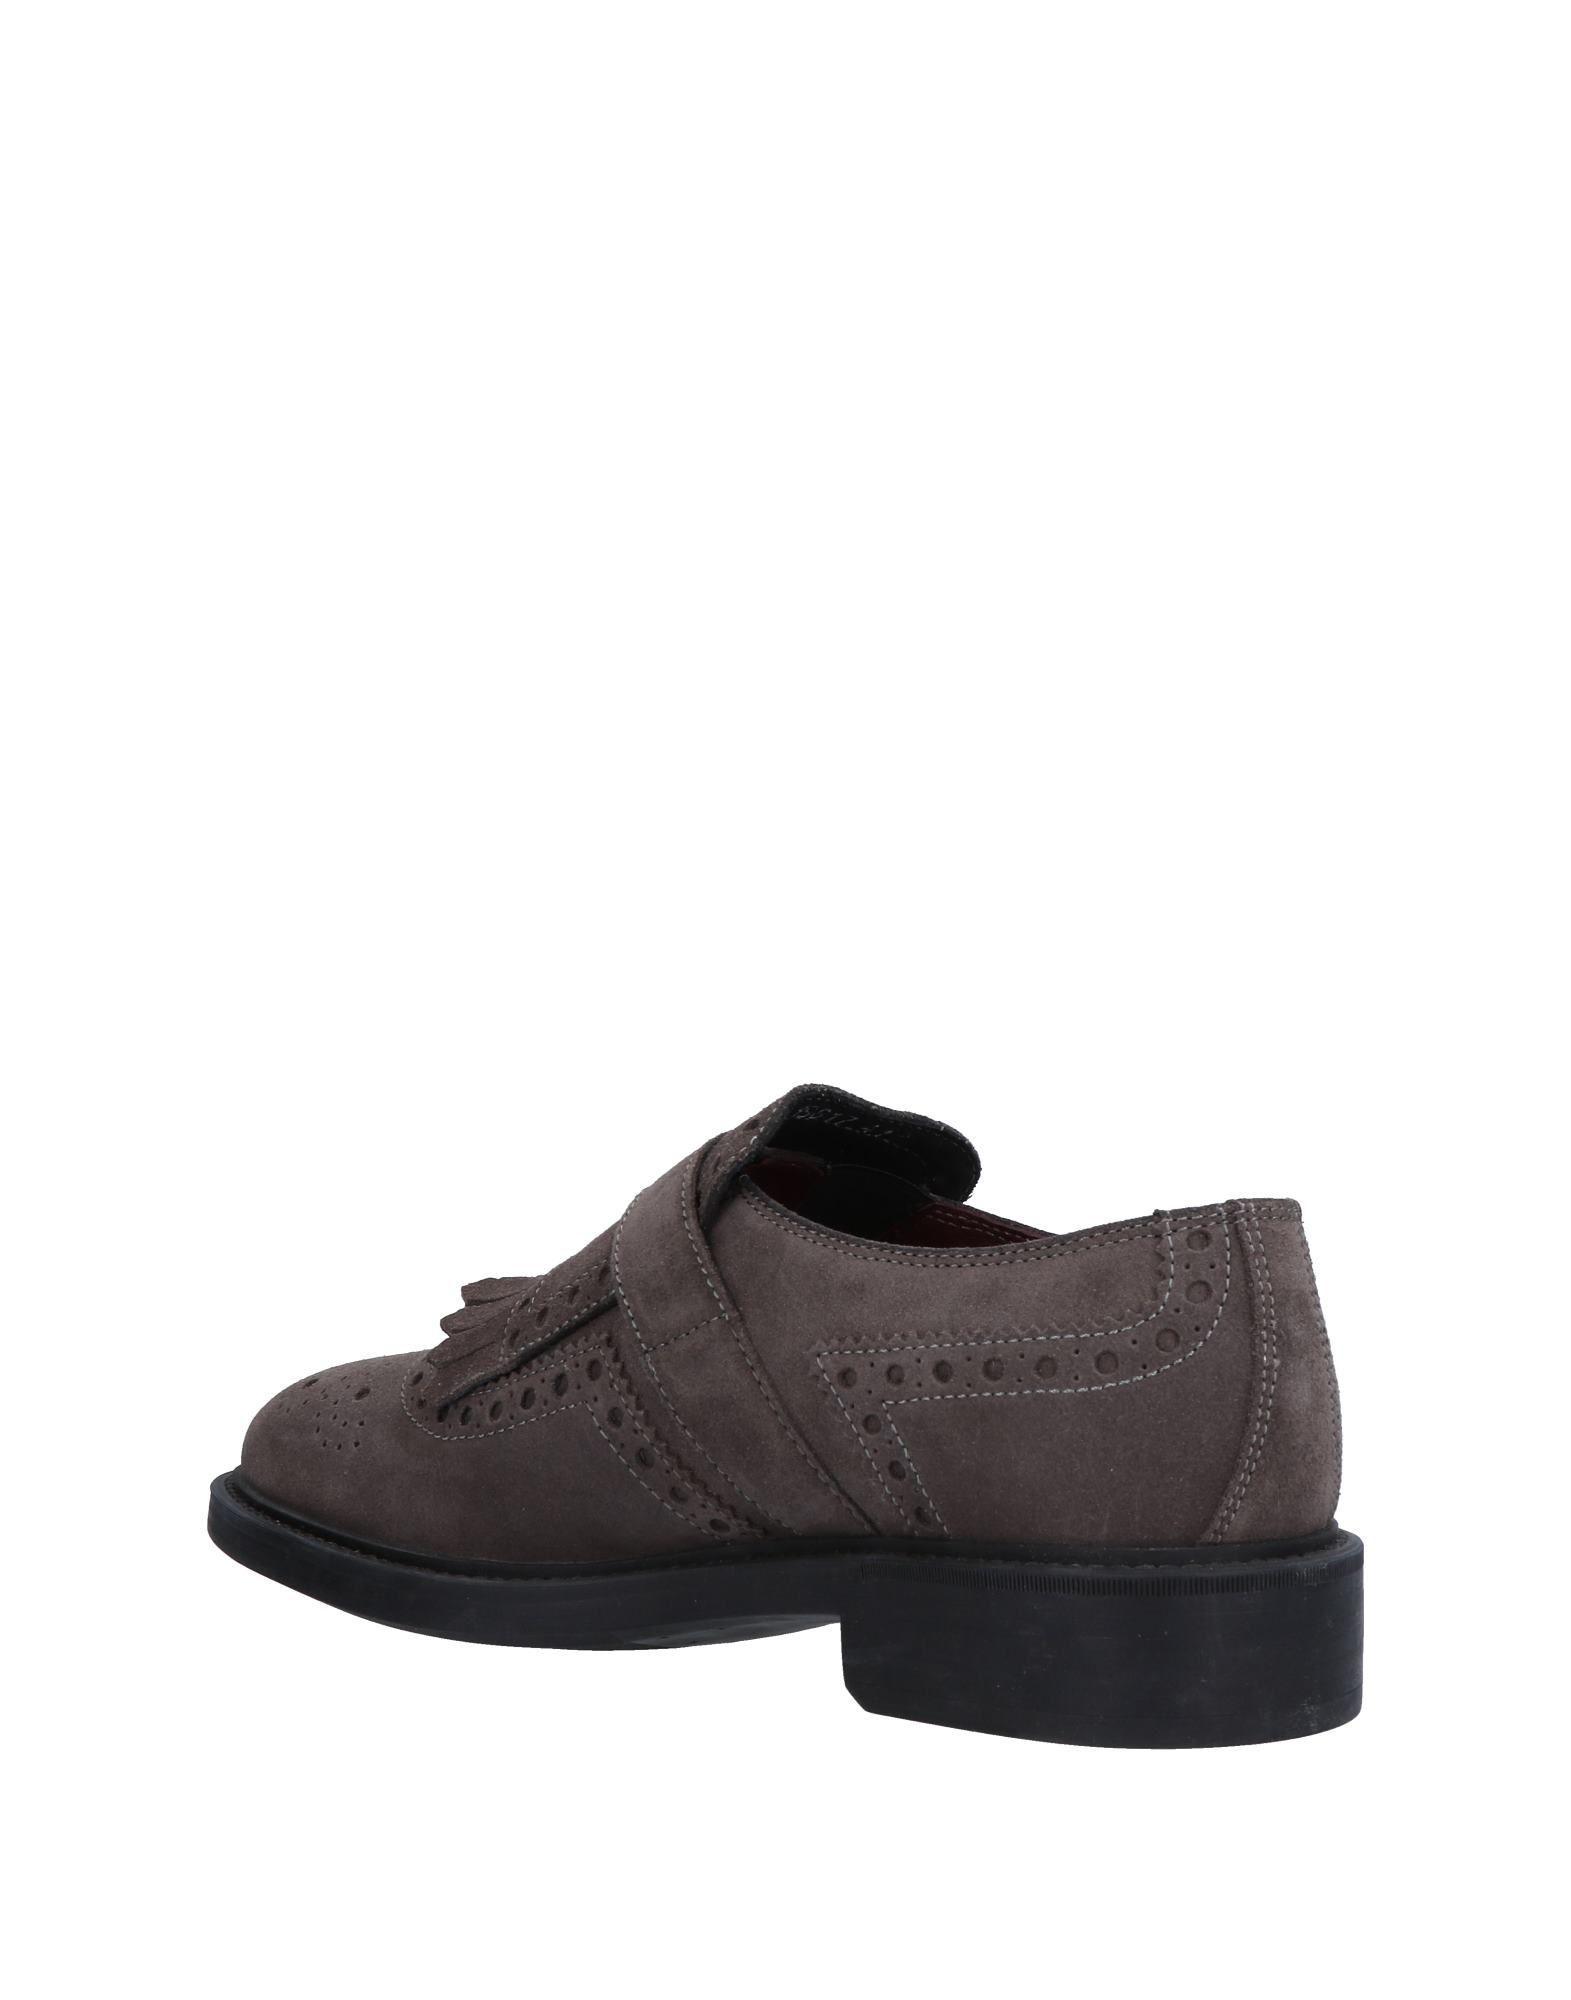 Antica Cuoieria Suede Loafers in Grey (Grey) for Men